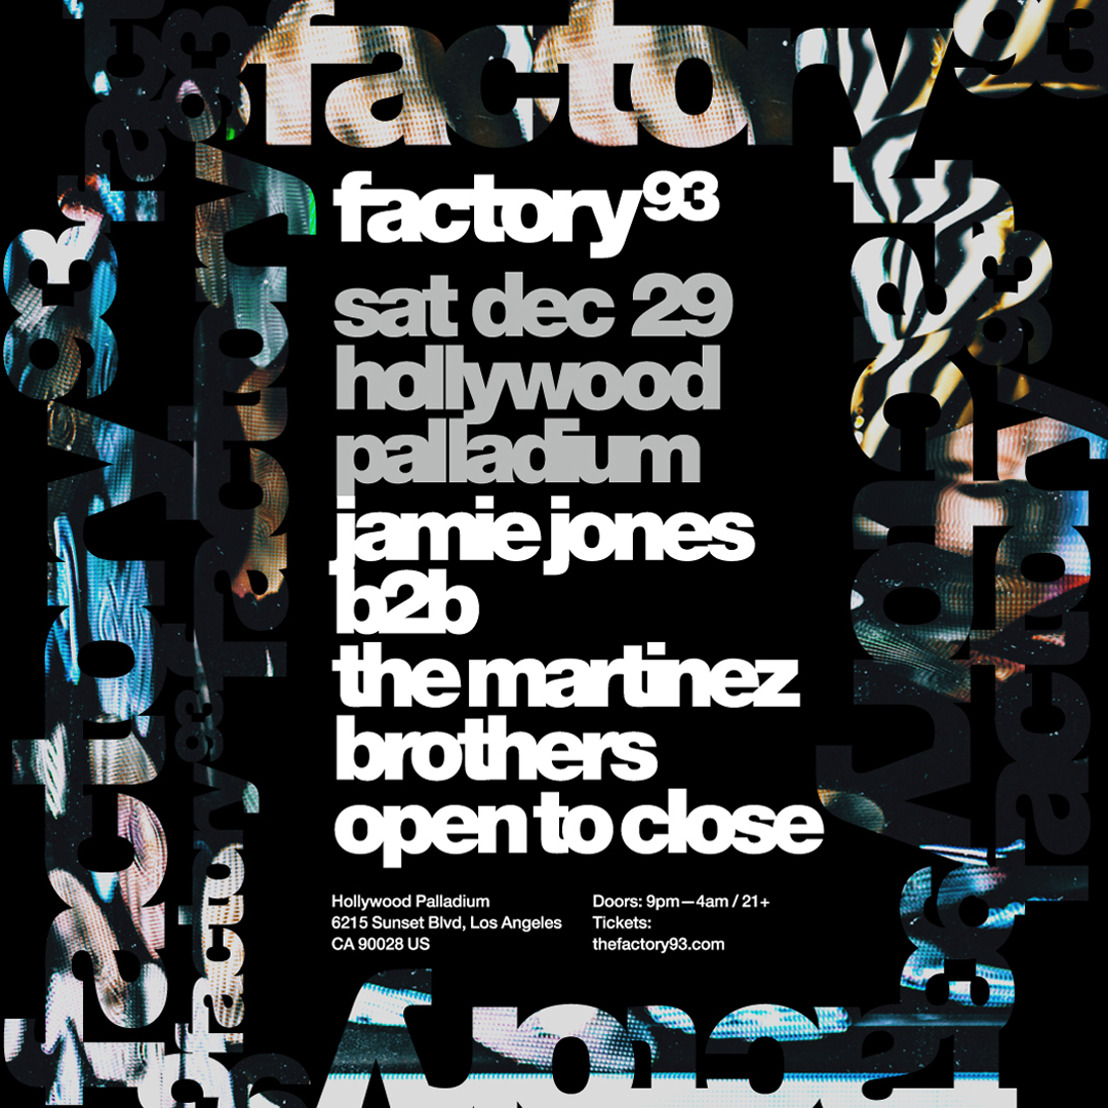 Factory 93 Jamie Jones b2b The Martinez Brothers